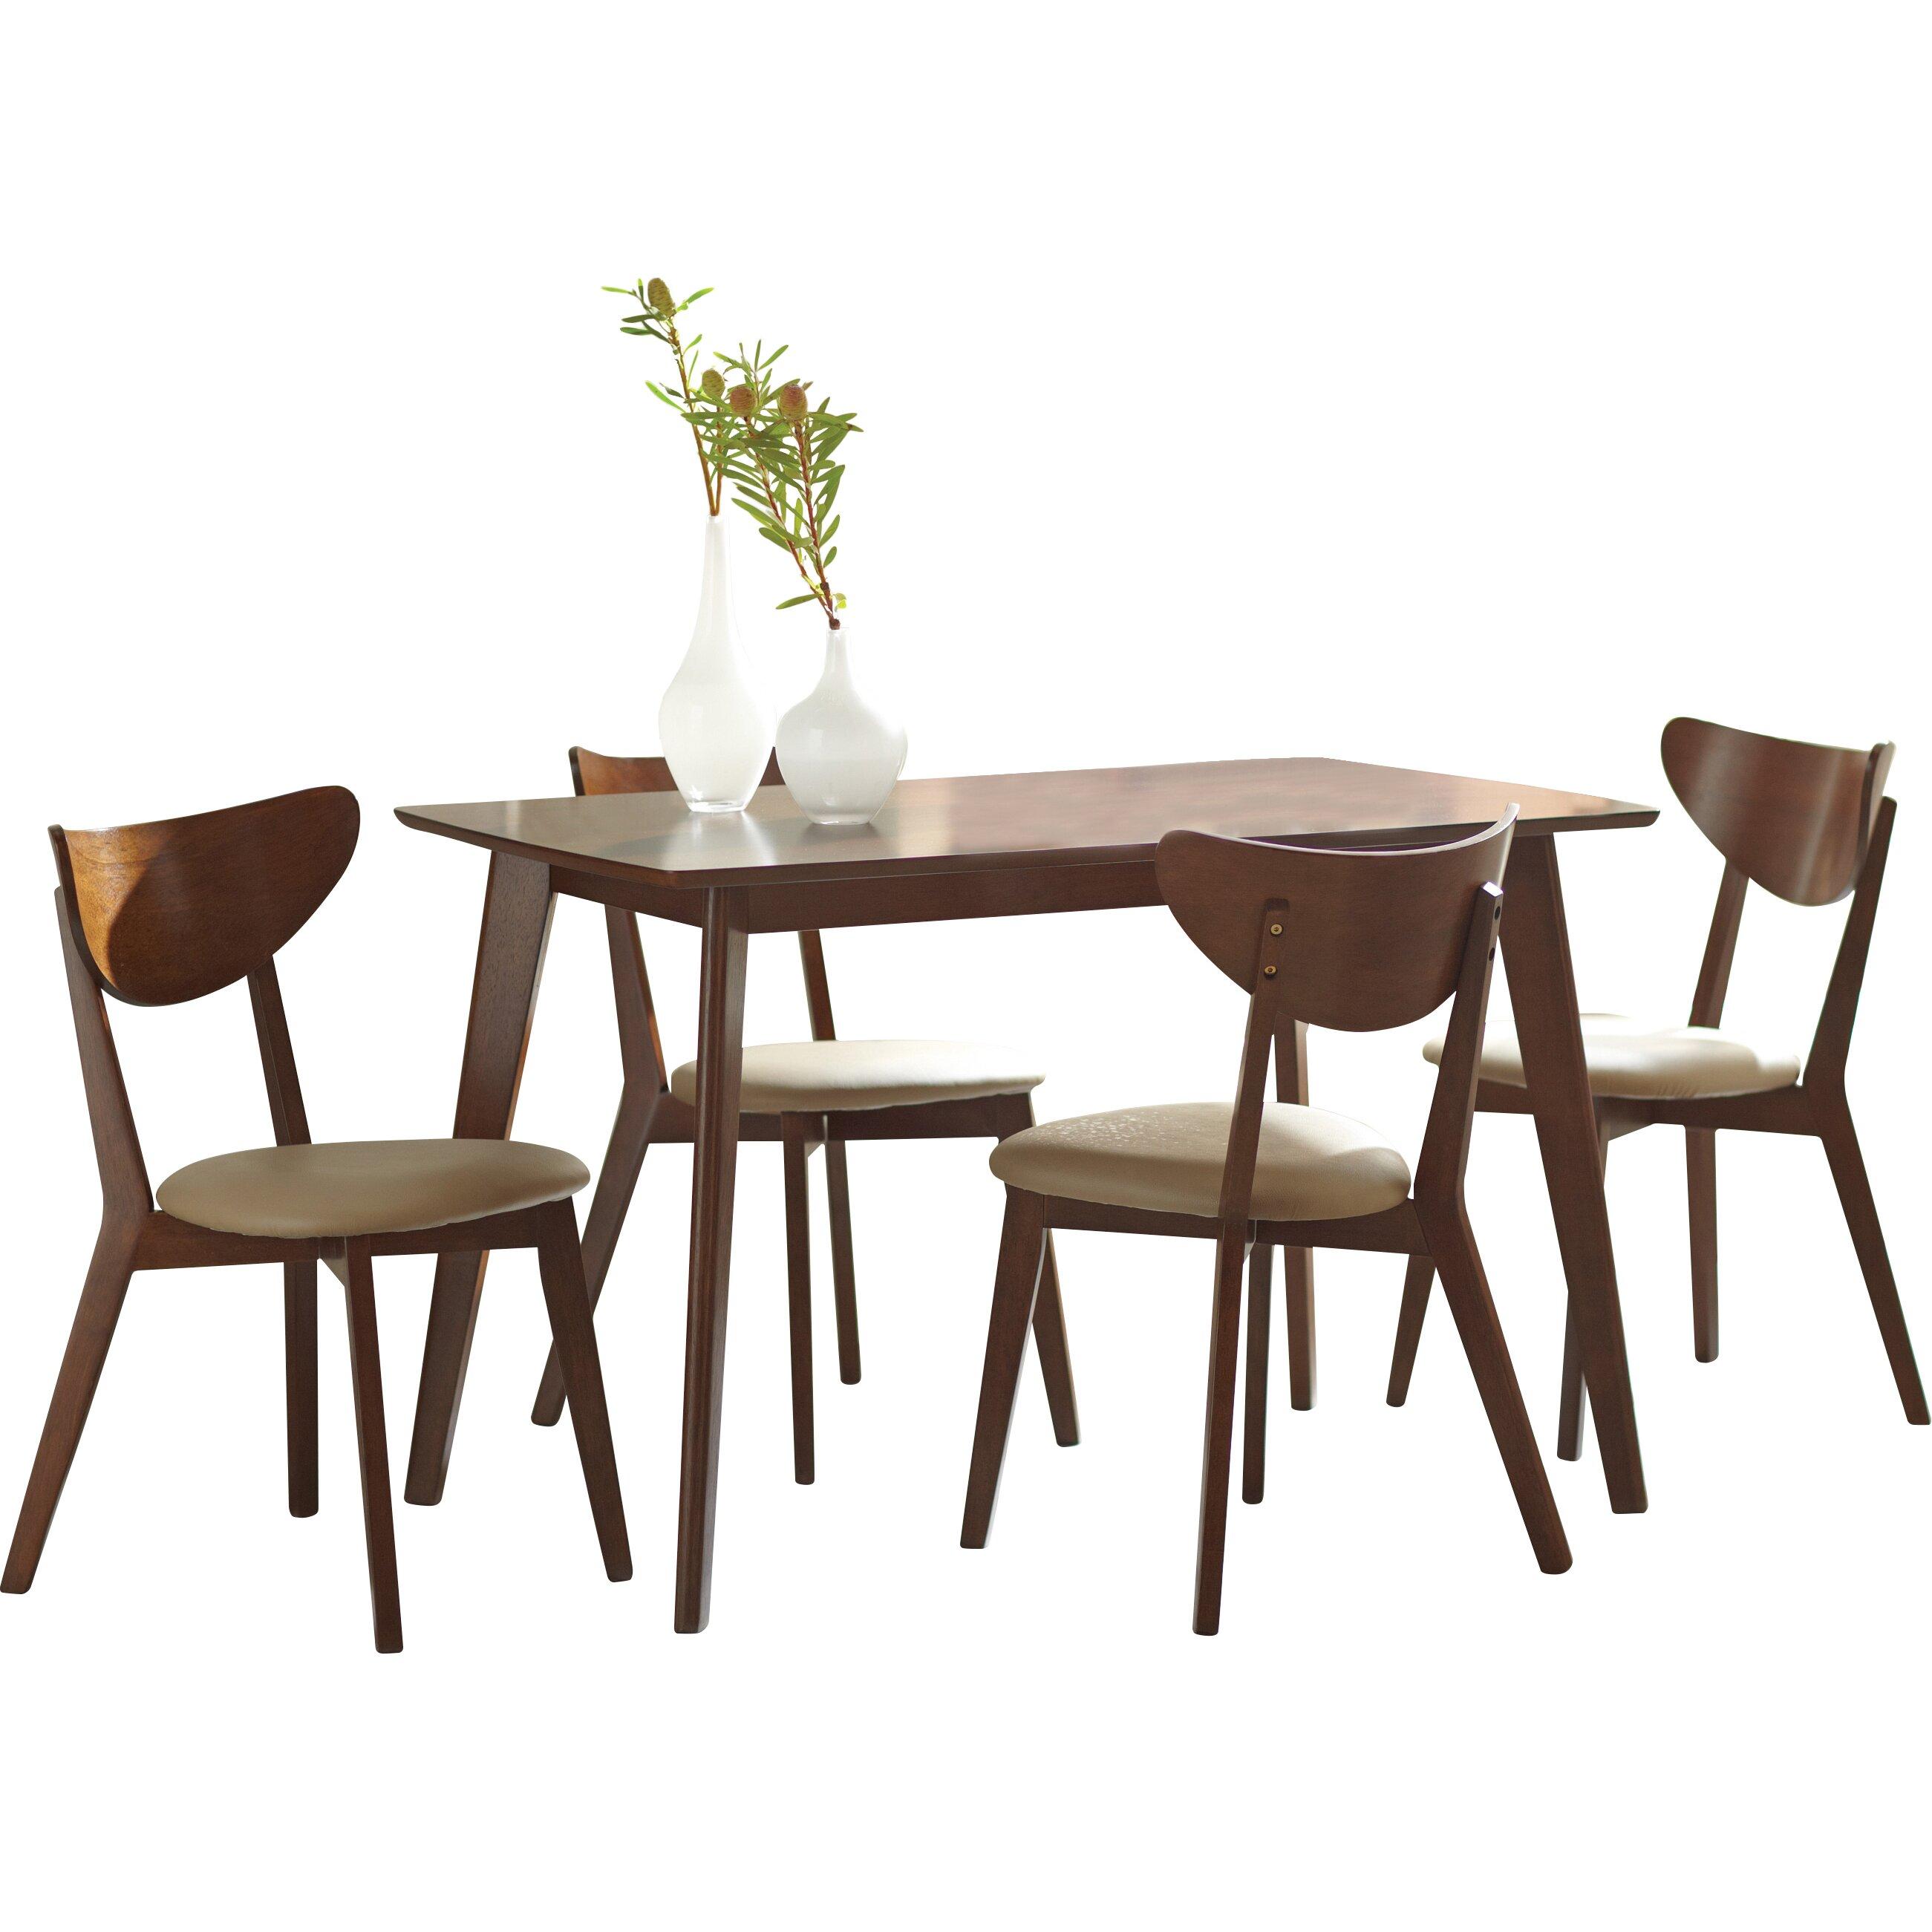 Wildon Home Dining Table Wildon Home 174 Montrose Dining  : Wildon Home 25C225AE Kersey Dining Table from amlibgroup.com size 2602 x 2602 jpeg 467kB